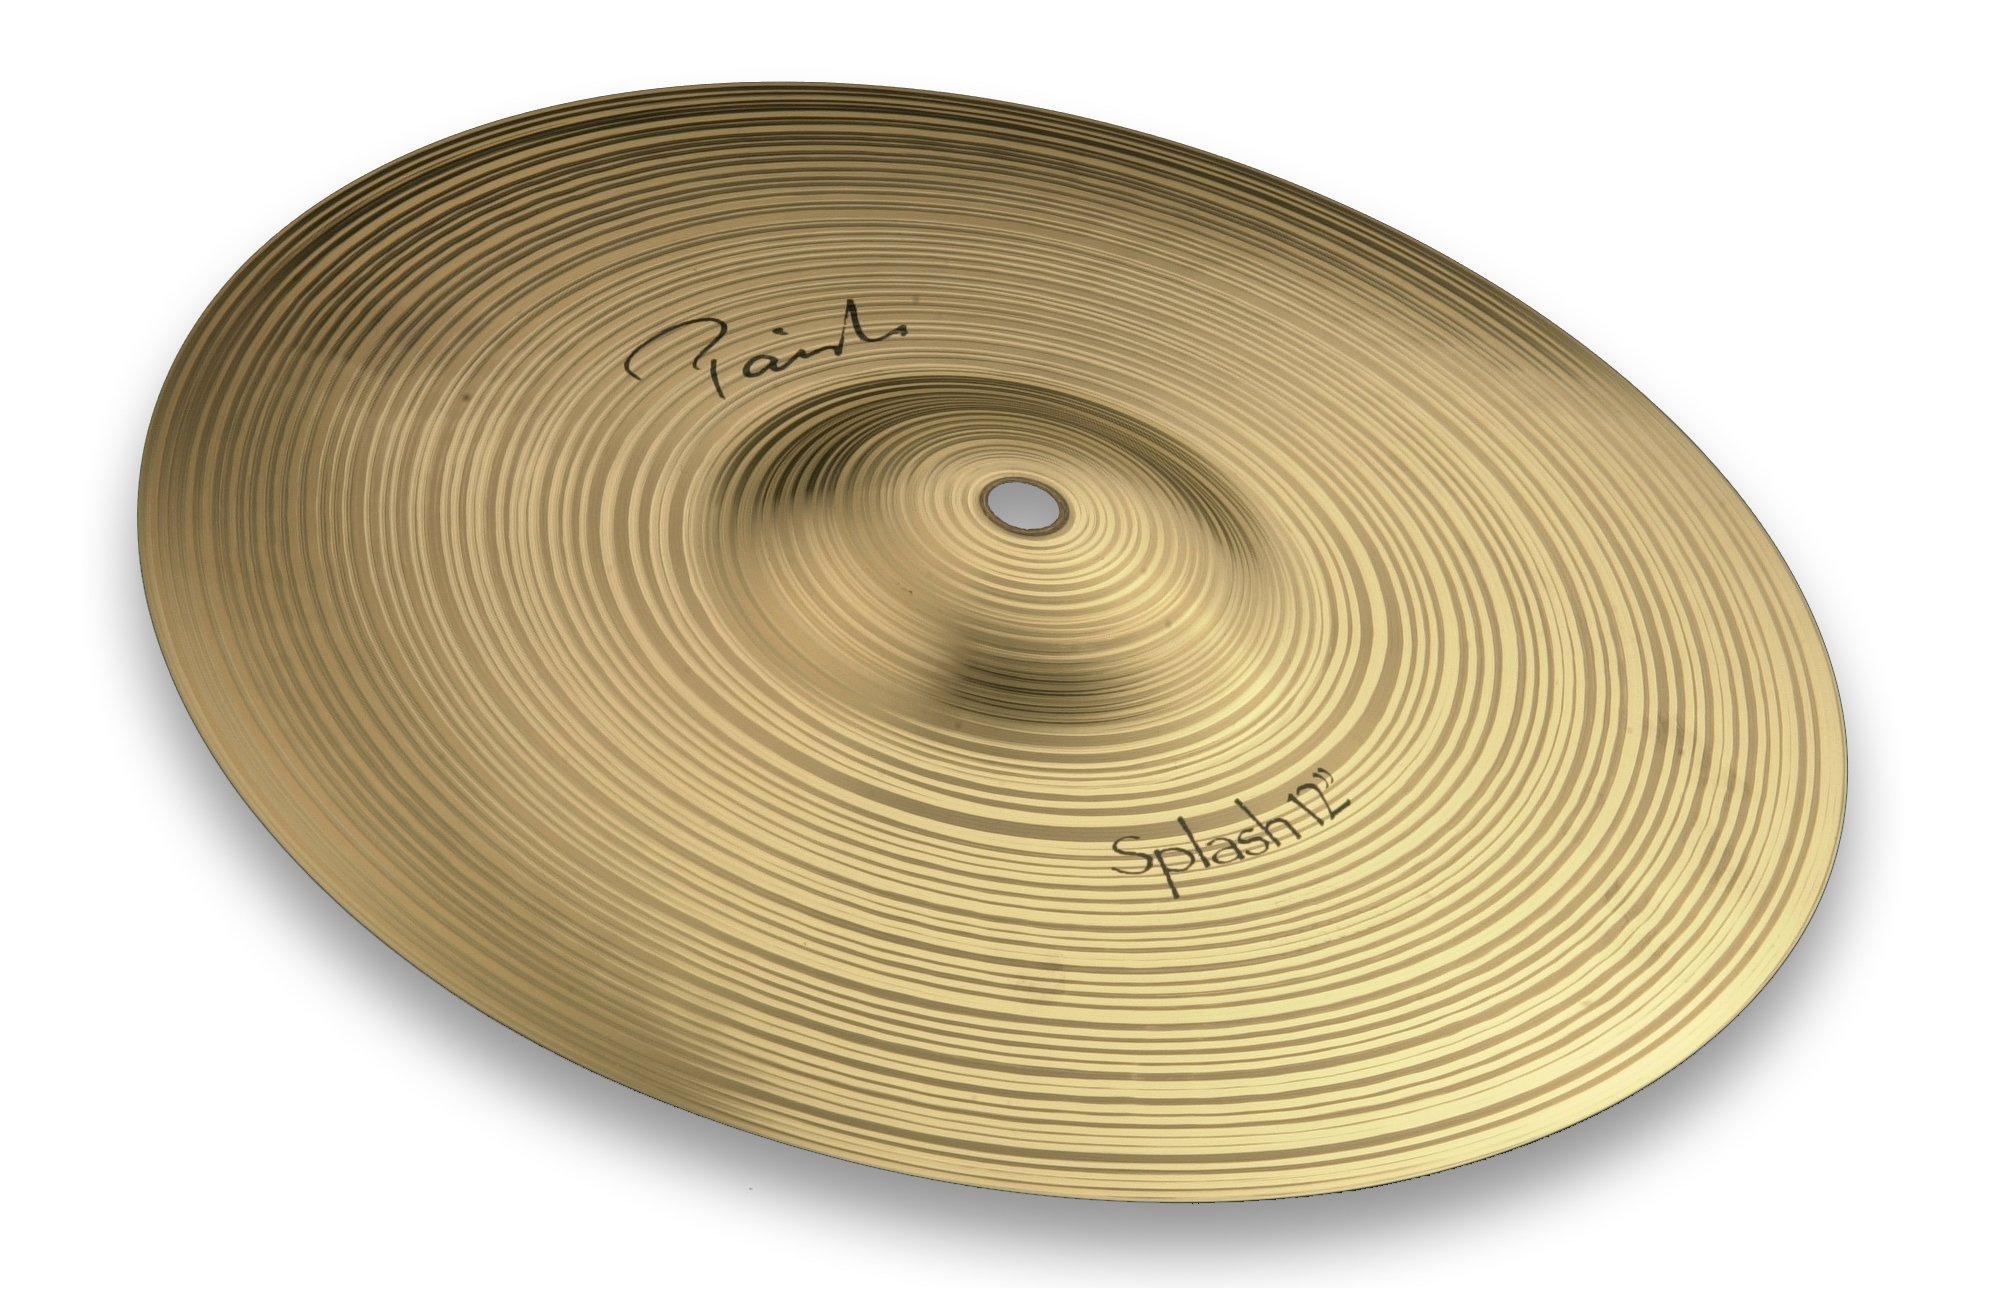 Paiste Signature Cymbal Splash 10-inch